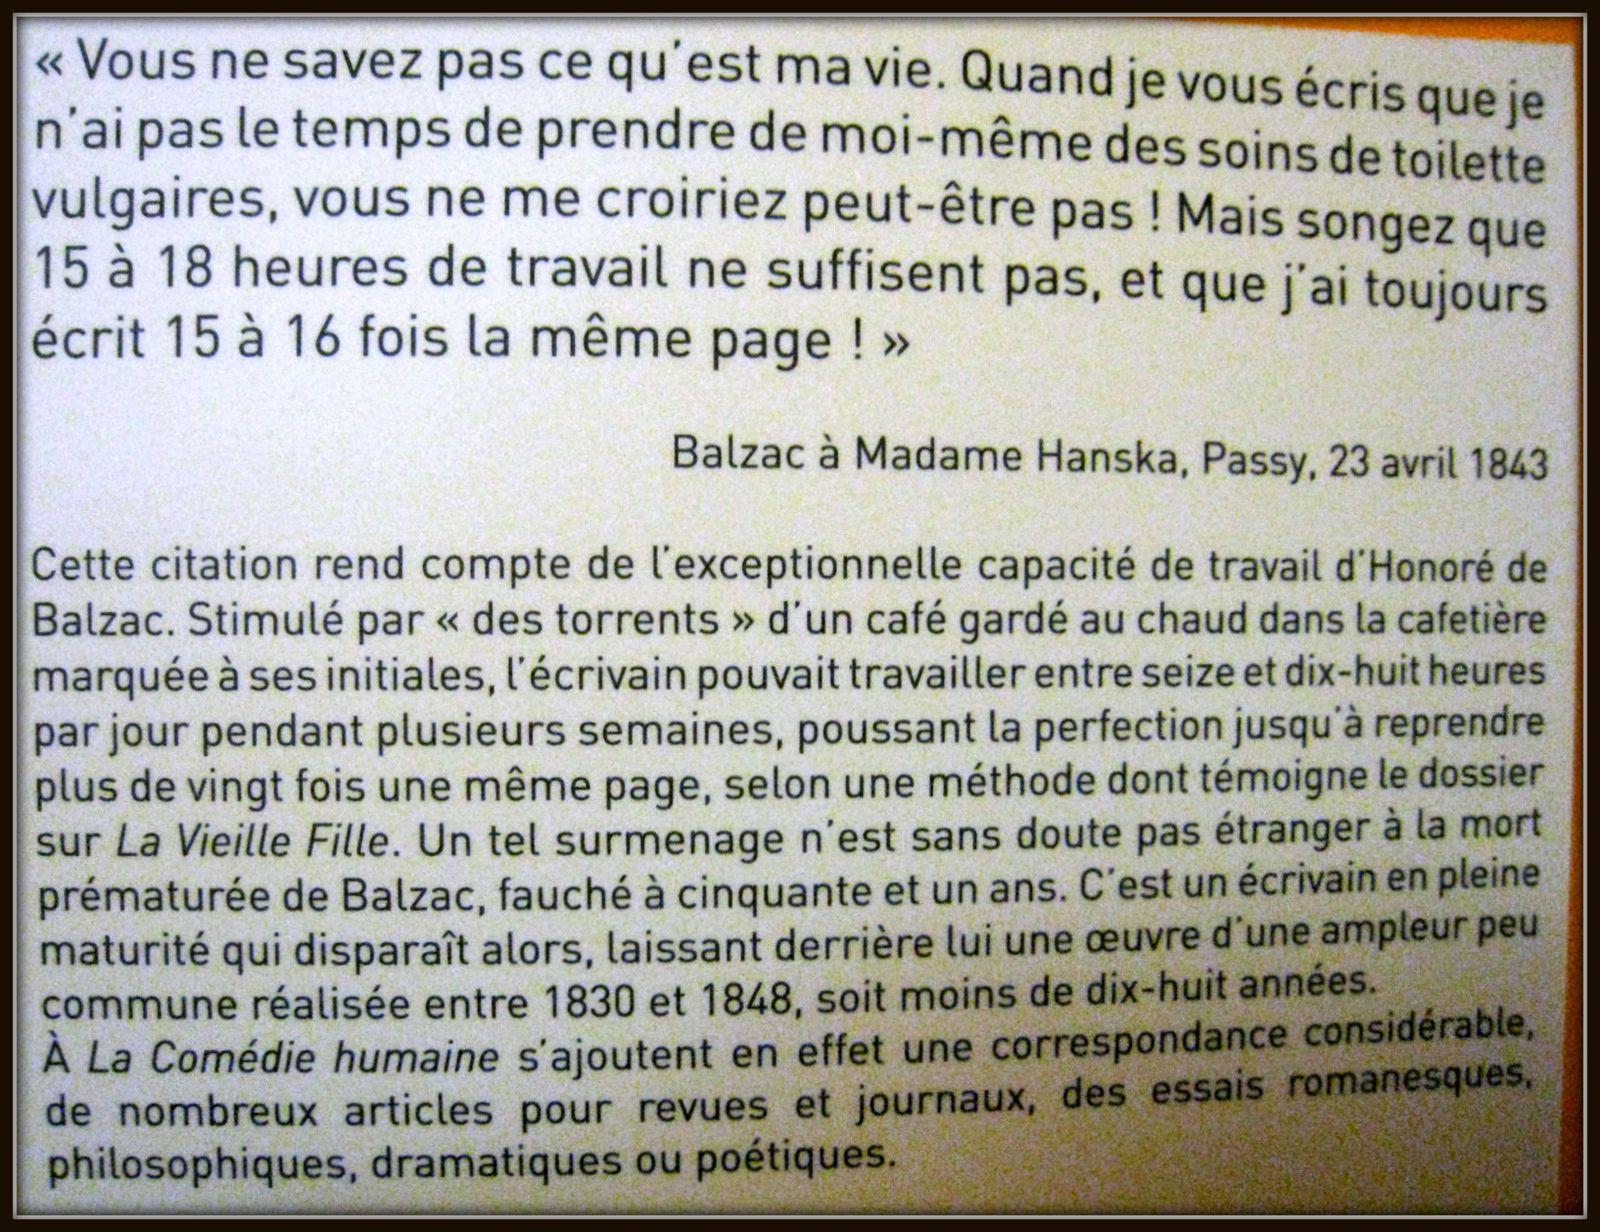 Pierre-Eugène-Emile Hébert, Honoré de Balzac